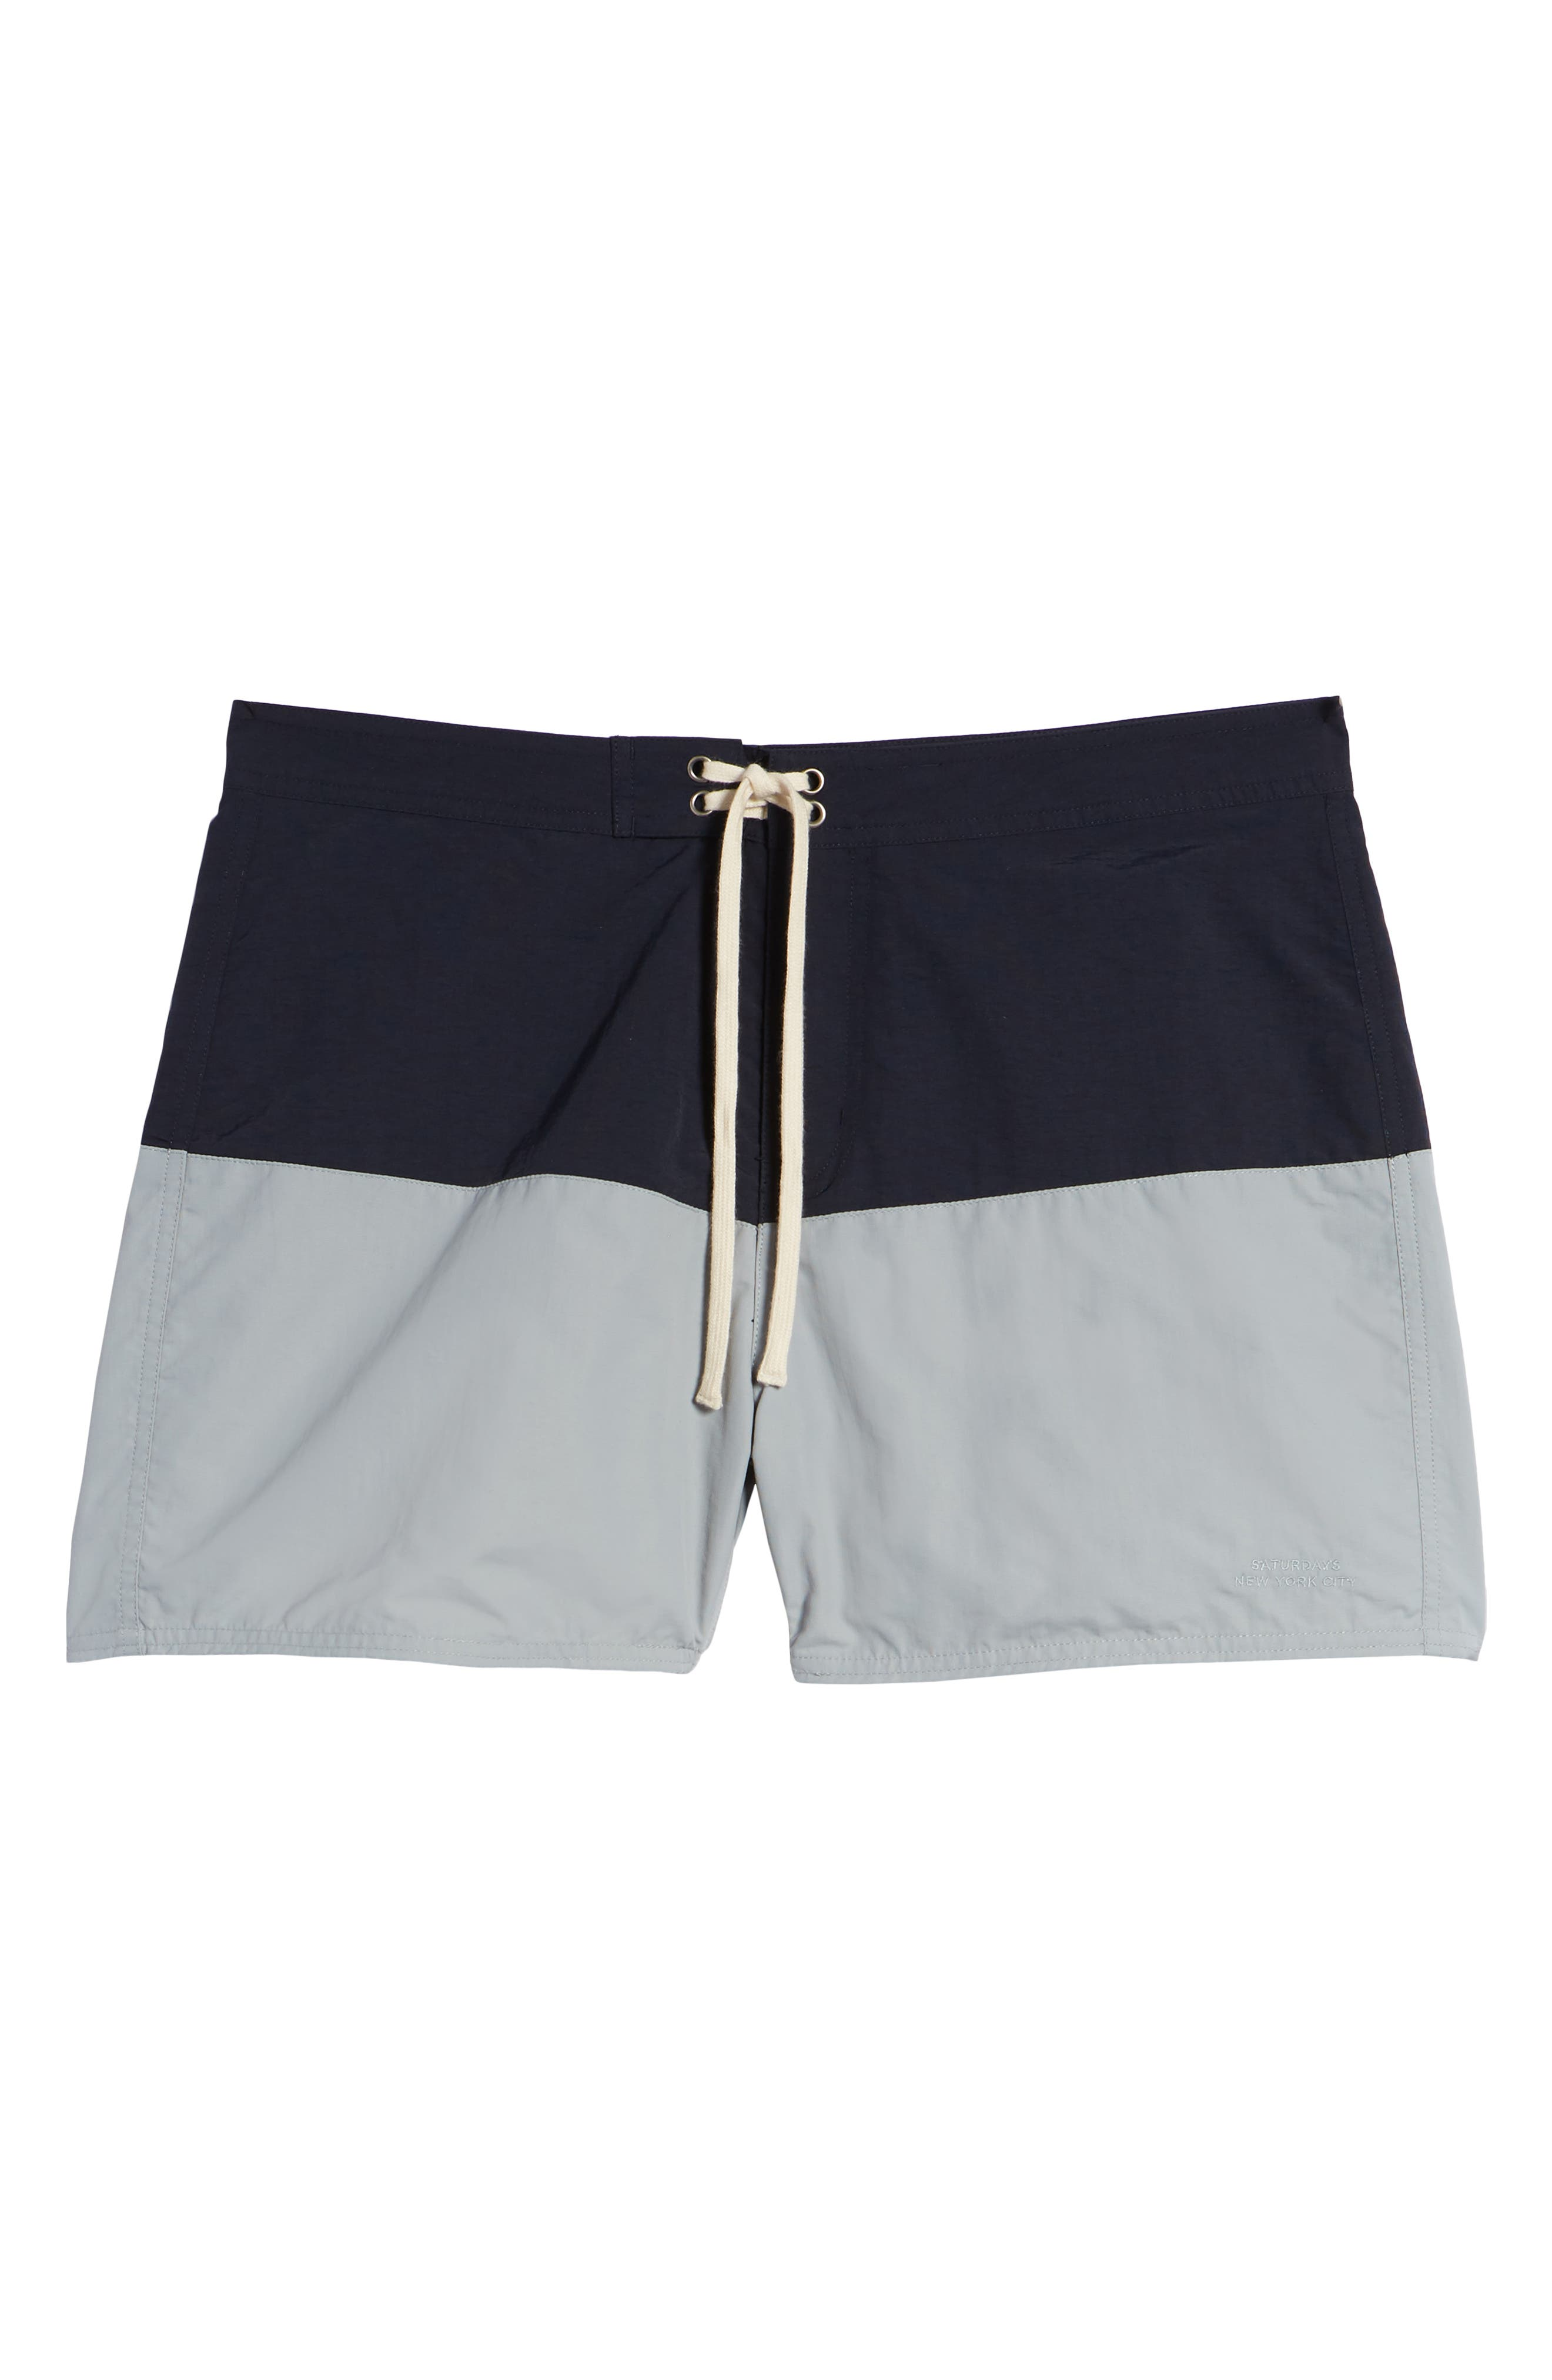 Ennis Board Shorts,                             Alternate thumbnail 6, color,                             408